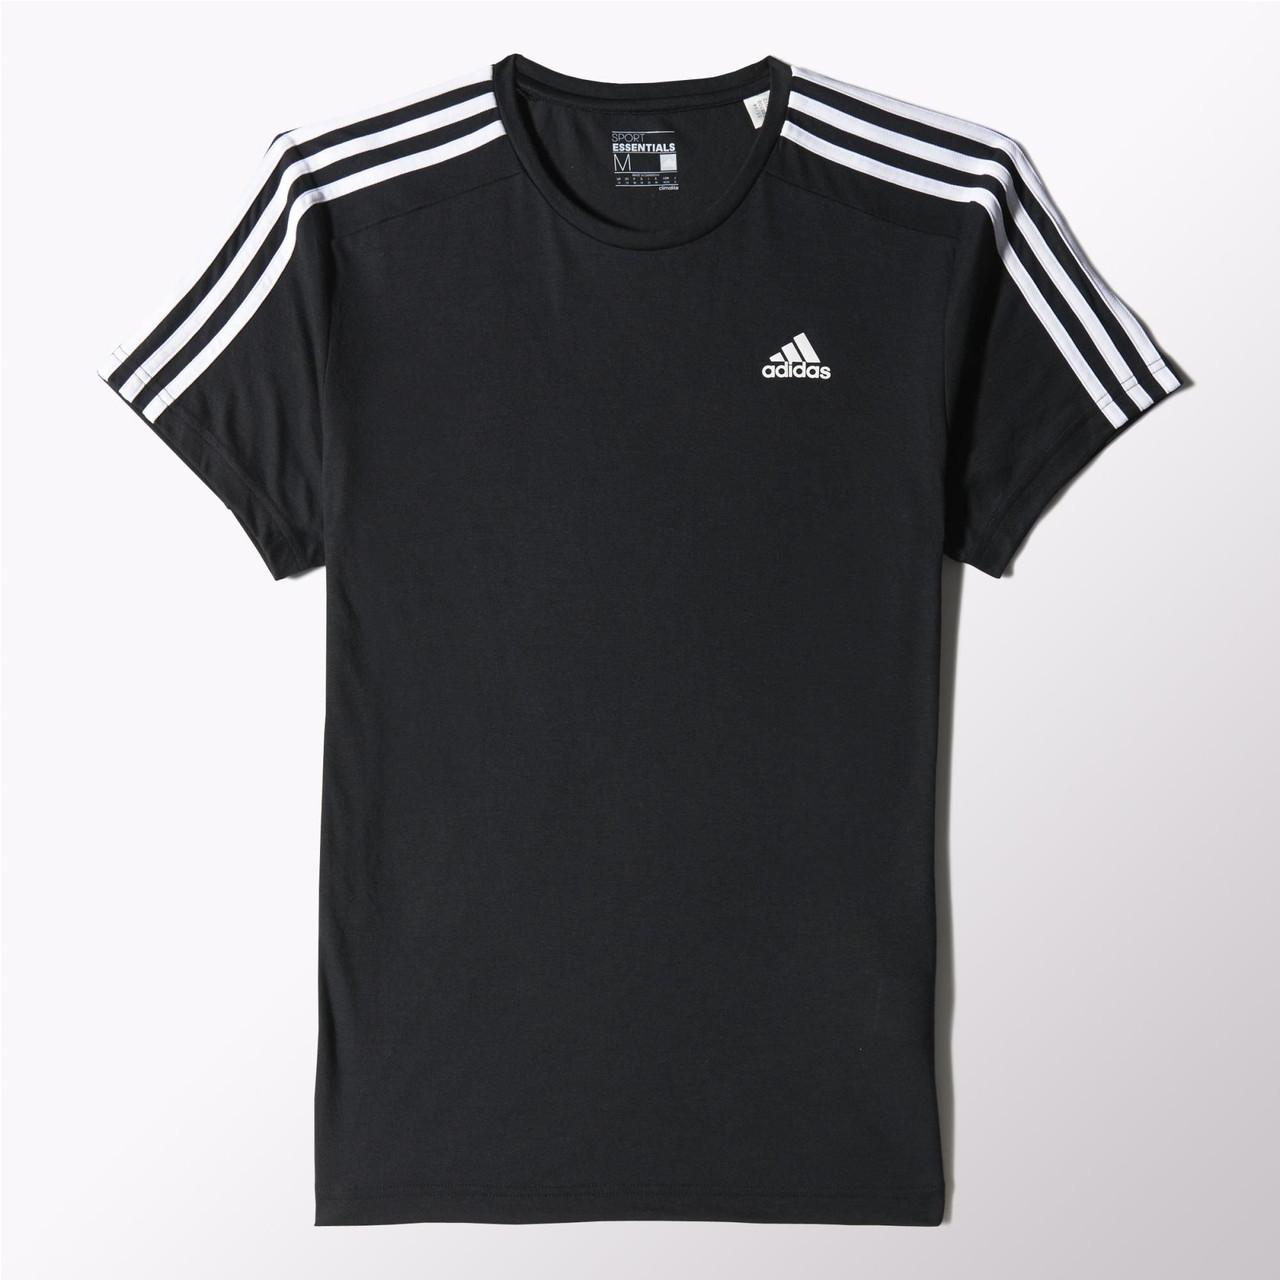 Мужская футболка Adidas Essentials 3-Stripes (Артикул: S88108)